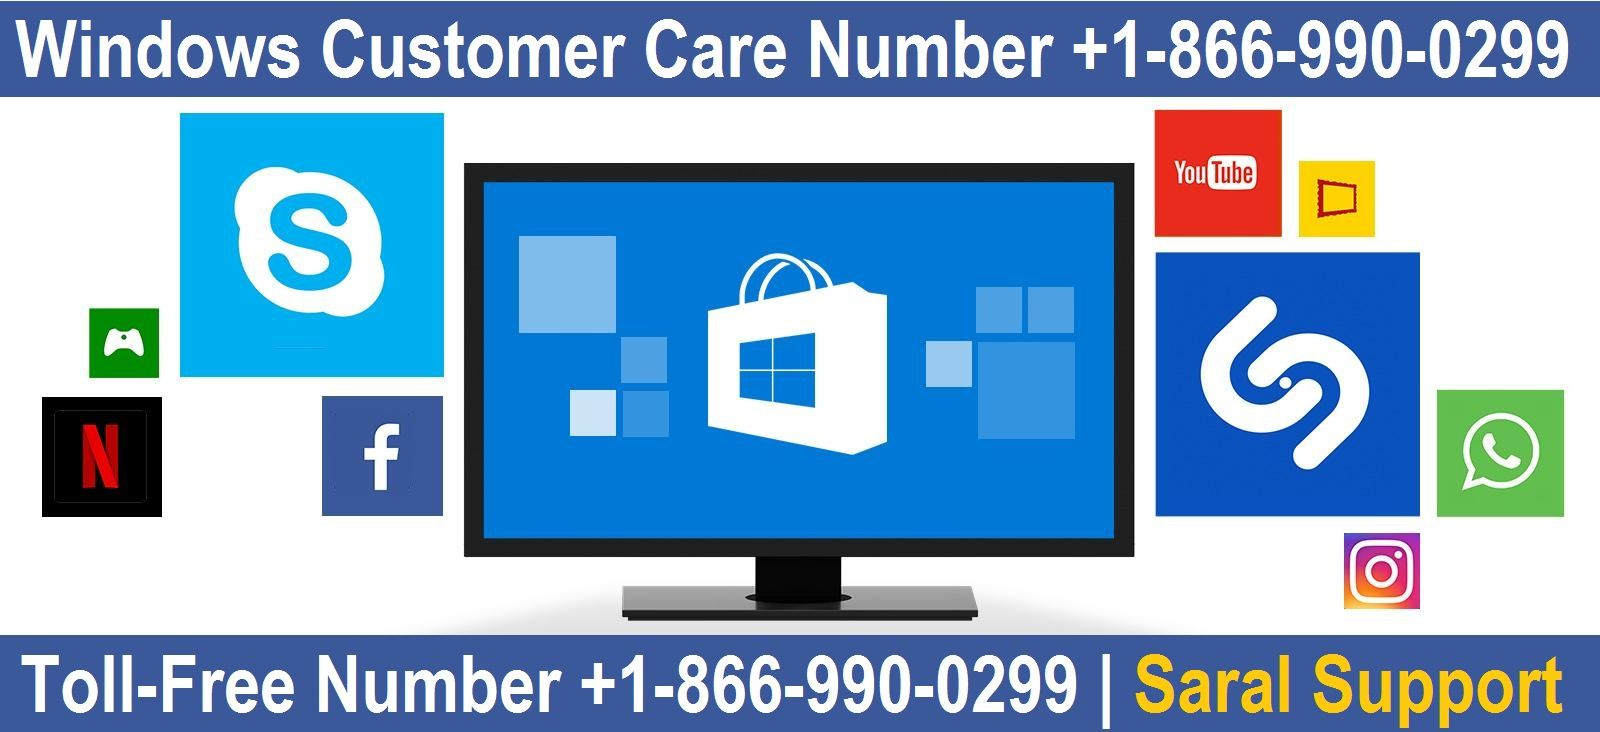 Pin on Windows Customer Service Number 18669900299